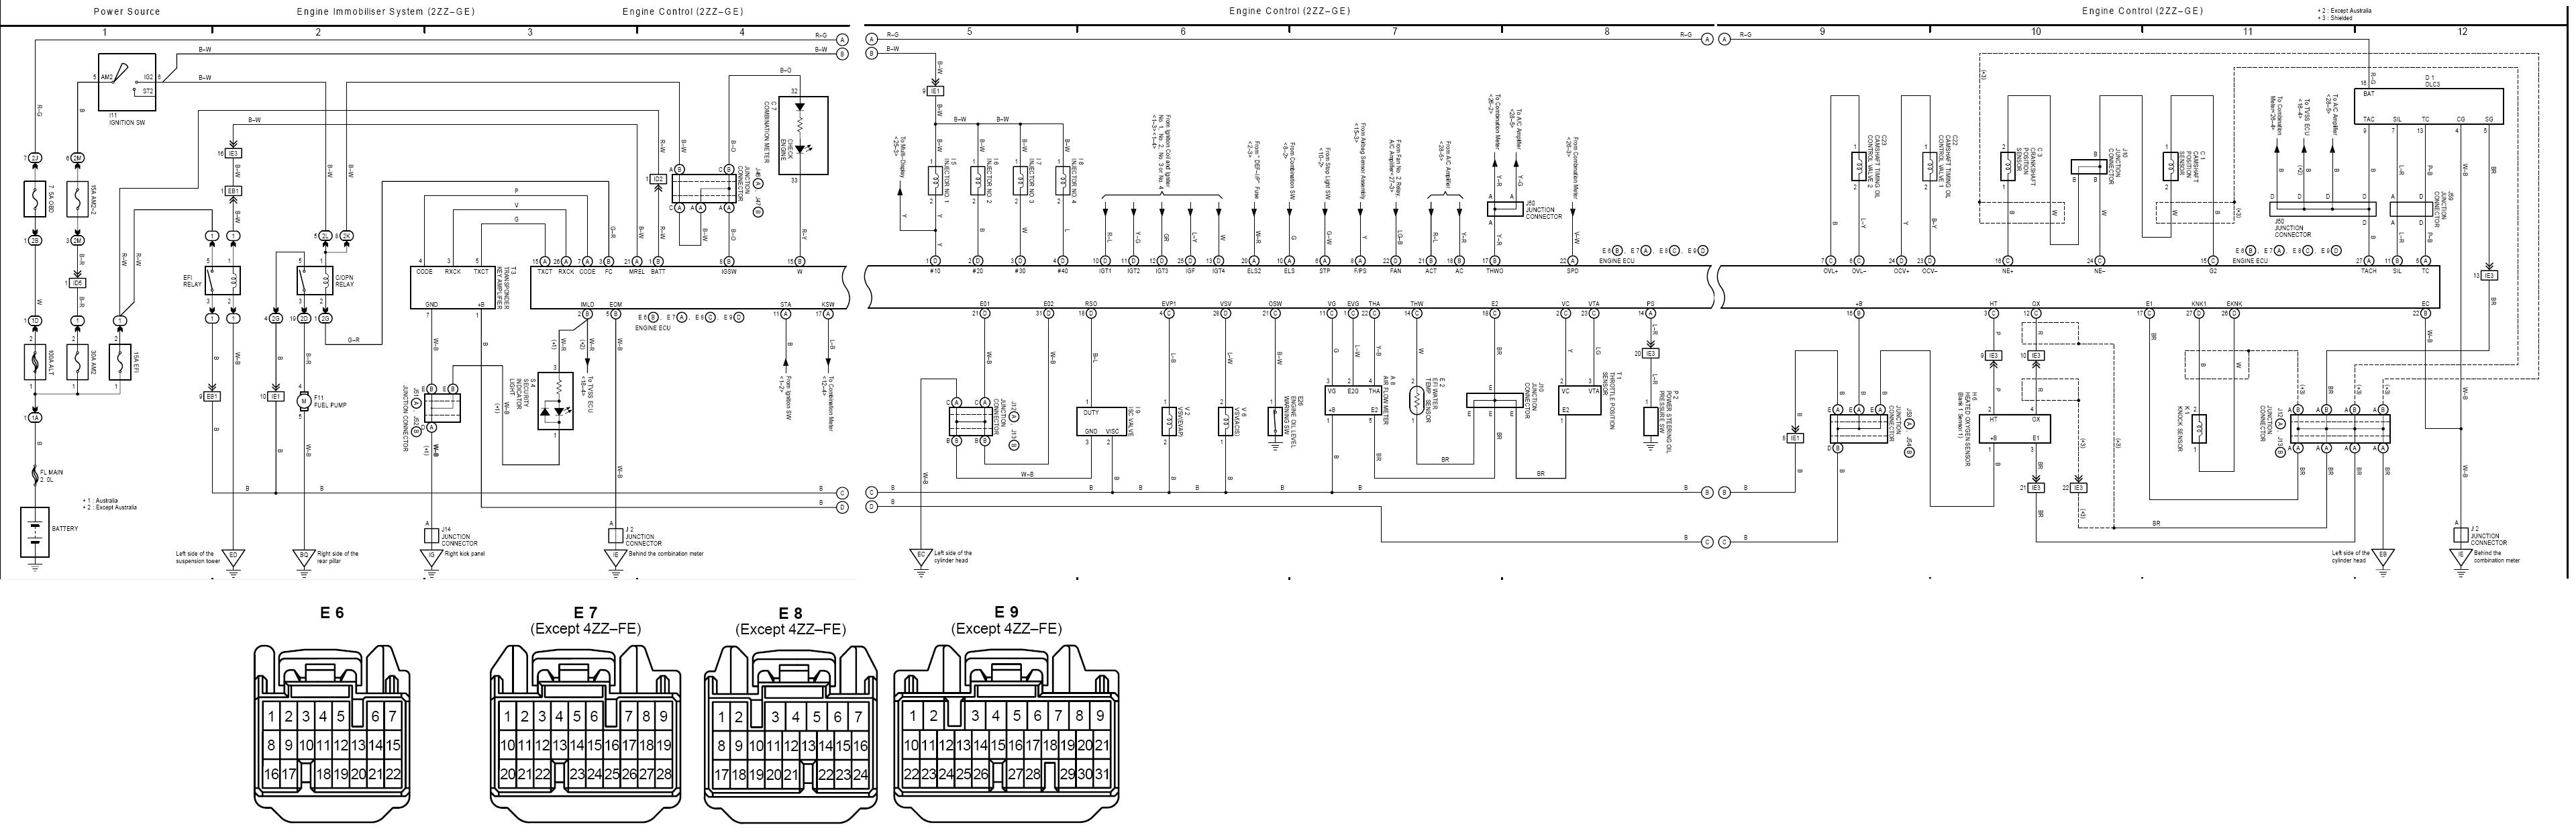 Ecu Wiring Diagram   Corolla Sportivo Club